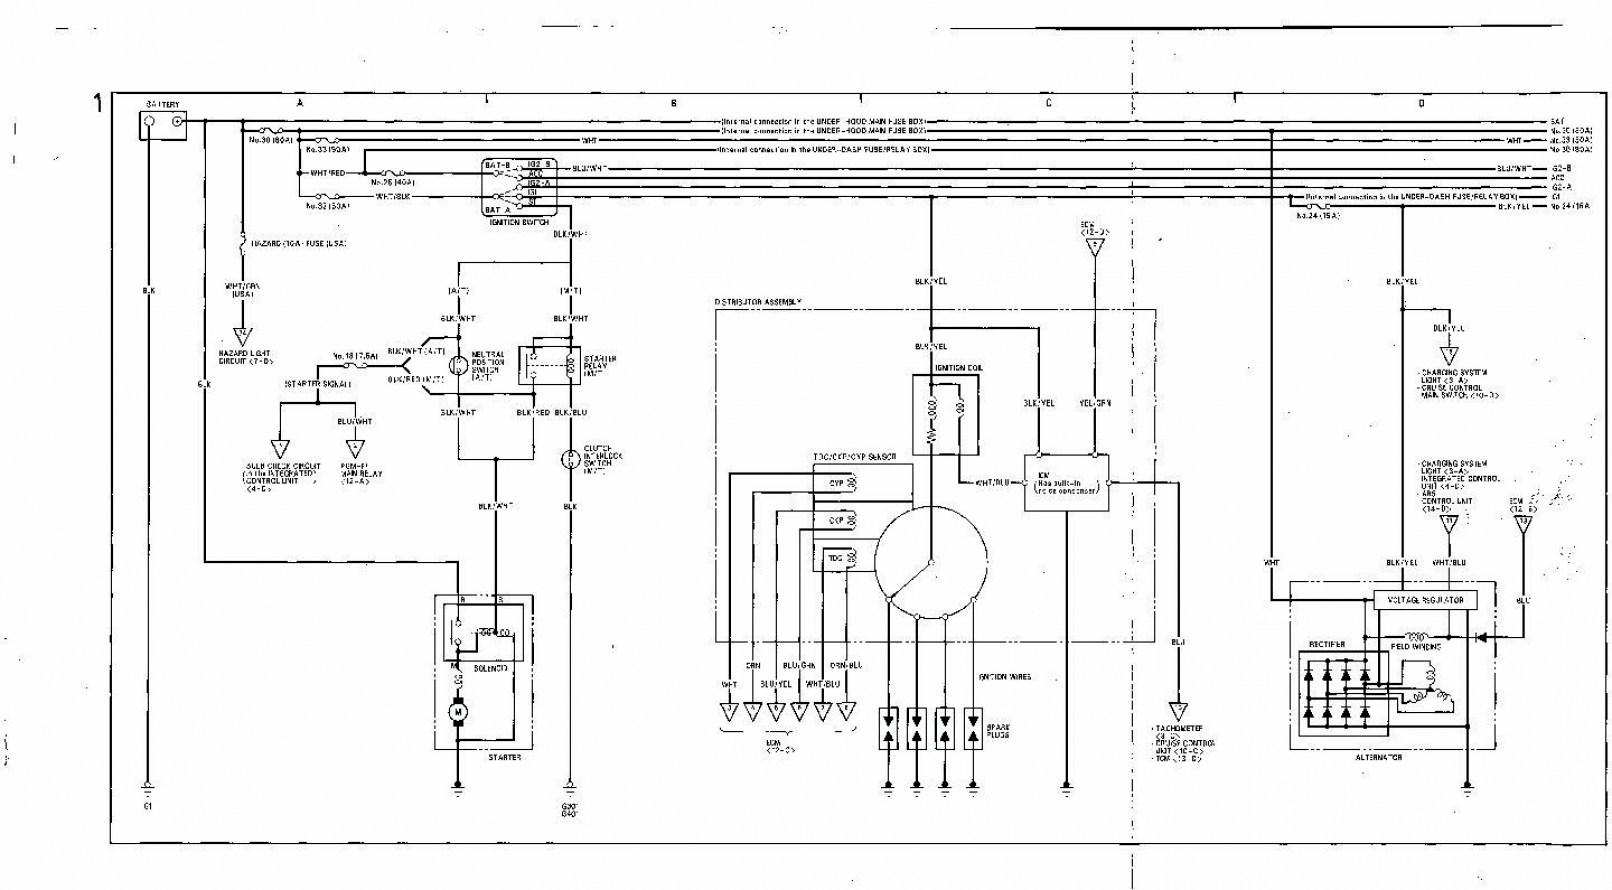 [SCHEMATICS_48EU]  GG_4303] 93 Integra Ignition Wiring Diagram Download Diagram | 1991 Acura Integra Distributor Wire Diagram |  | Swas Lotap Dome Mohammedshrine Librar Wiring 101